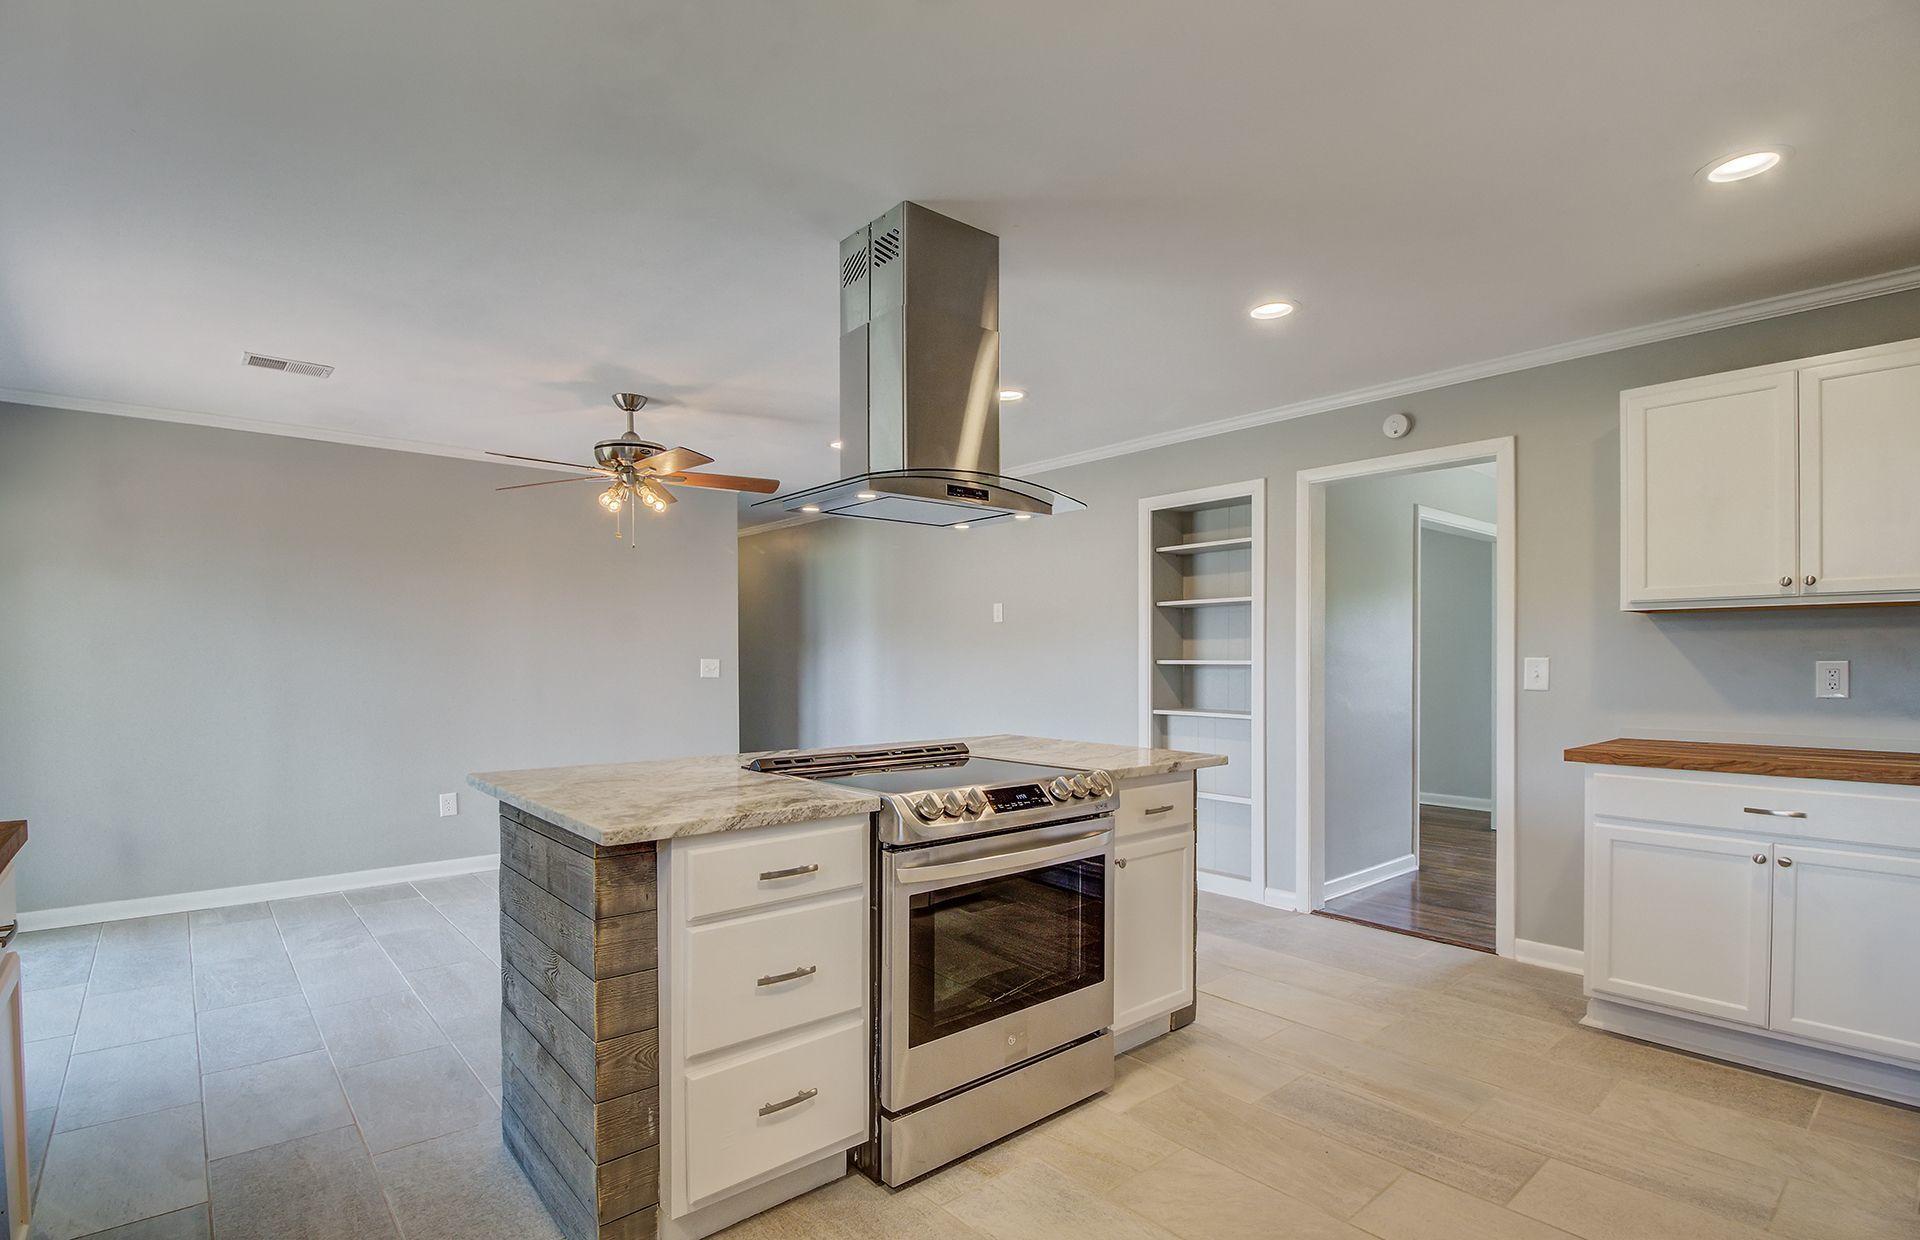 Belvedere Estates Homes For Sale - 6010 Ridgecrest, Hanahan, SC - 2